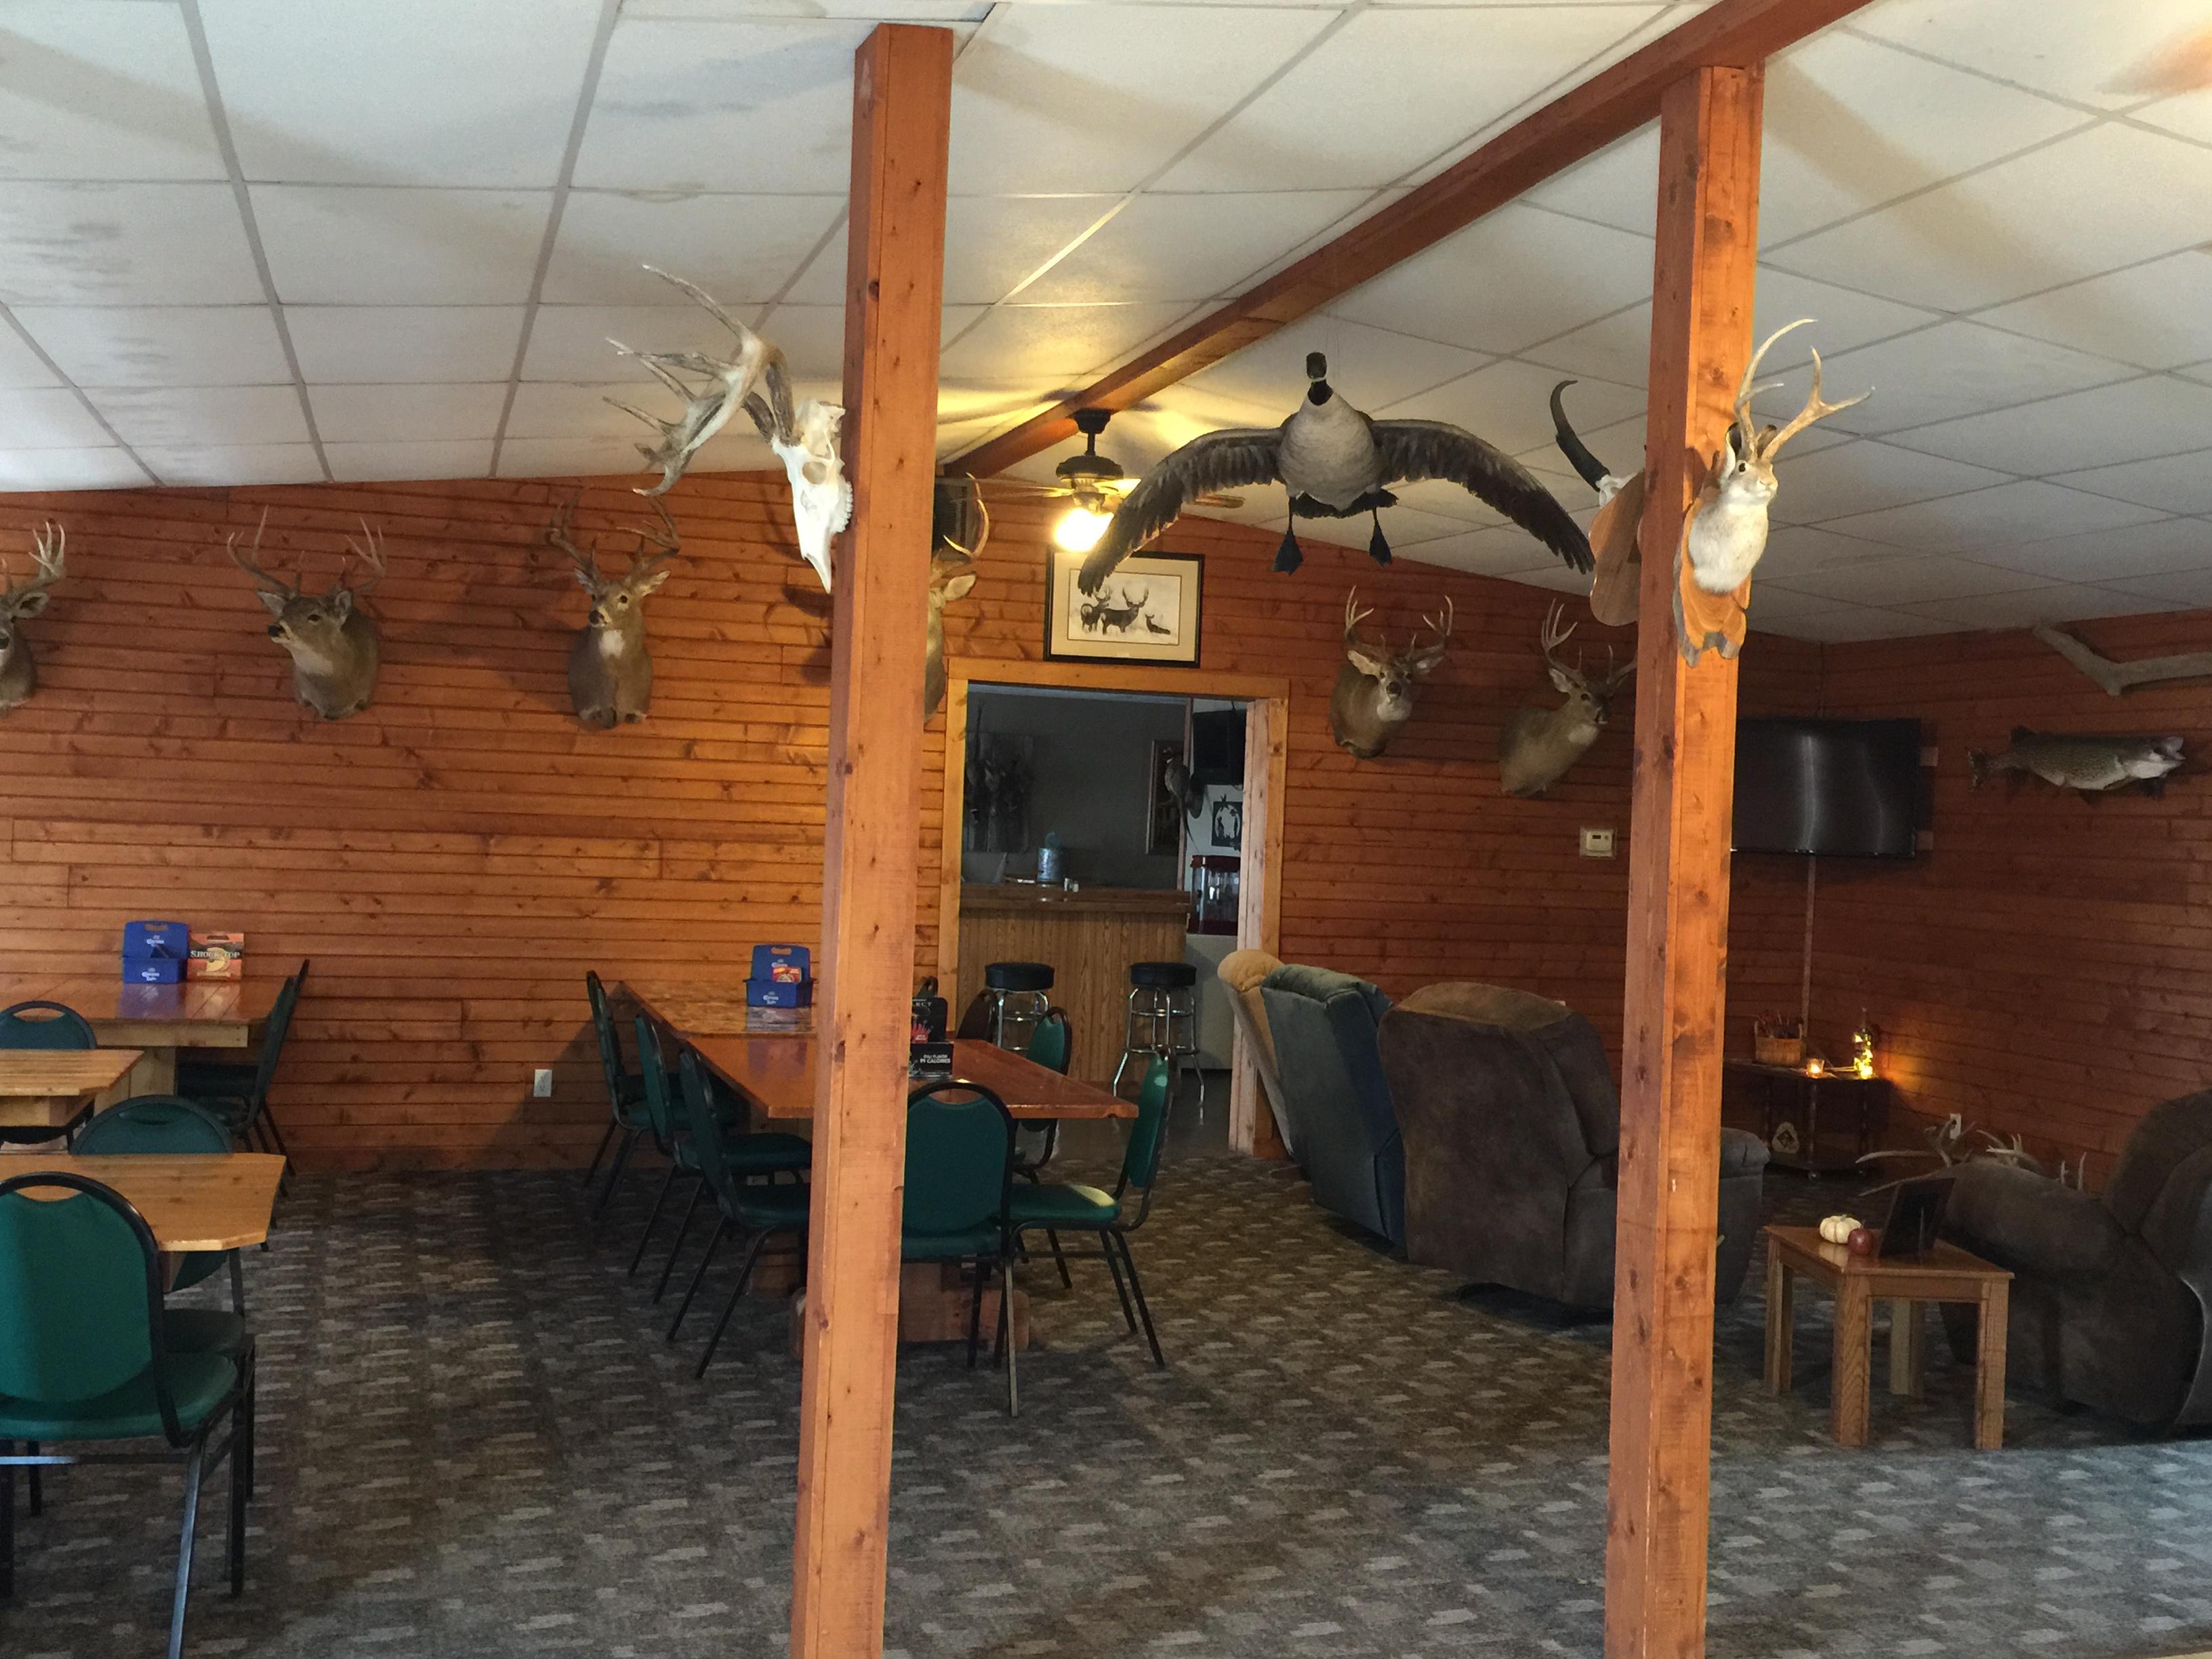 0bce31d2b2b Dining - West Prairie Resort on Lake Oahe - Central South Dakota